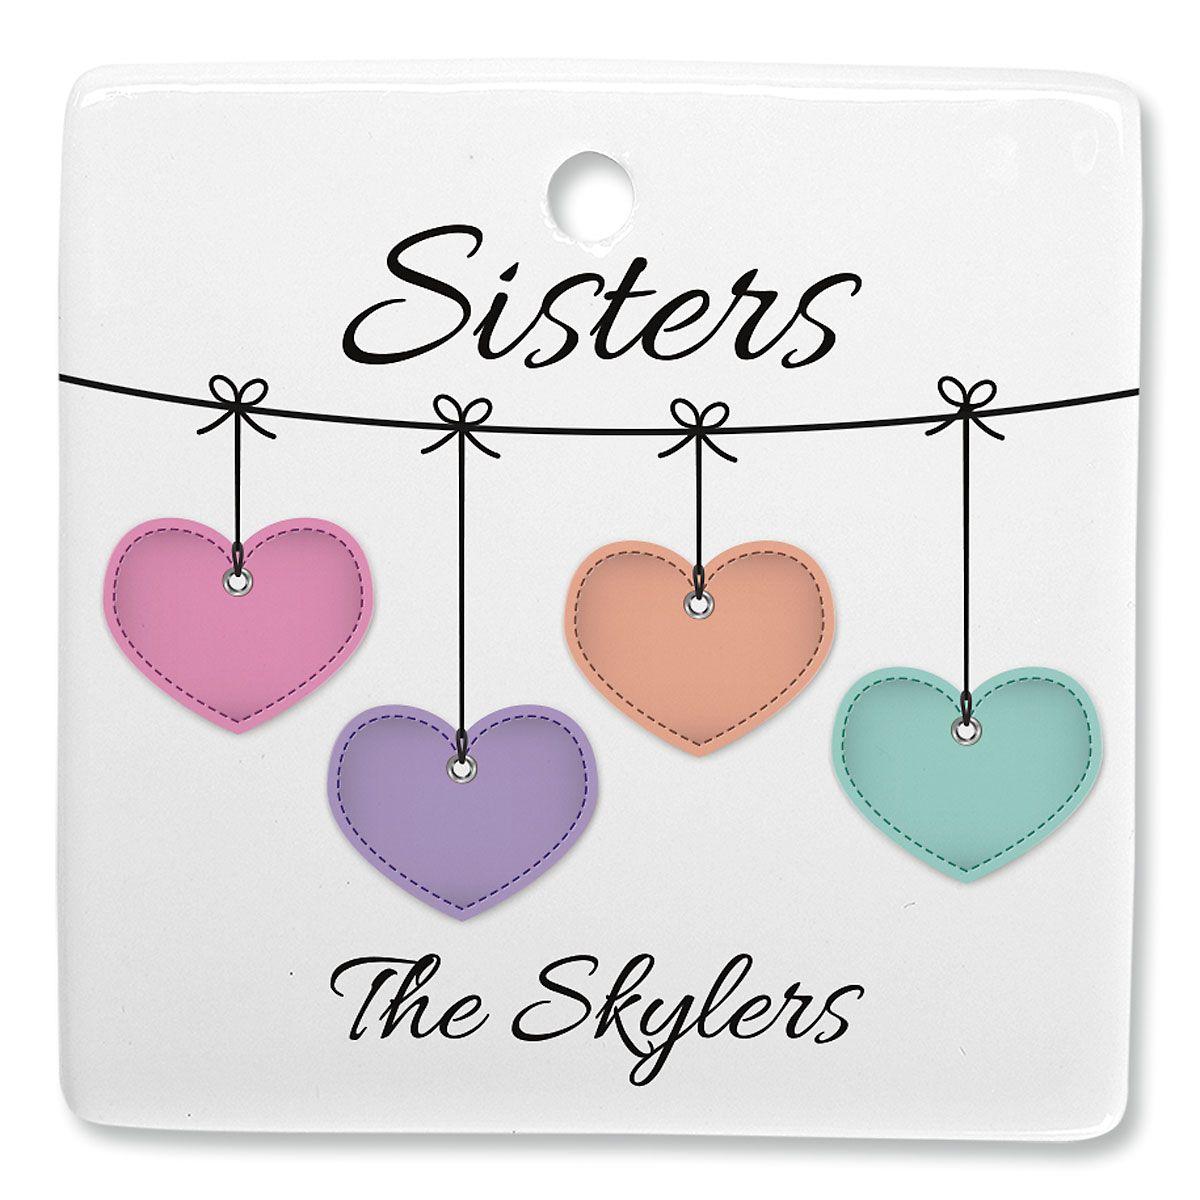 Sister Hearts Personalized Ornament Square